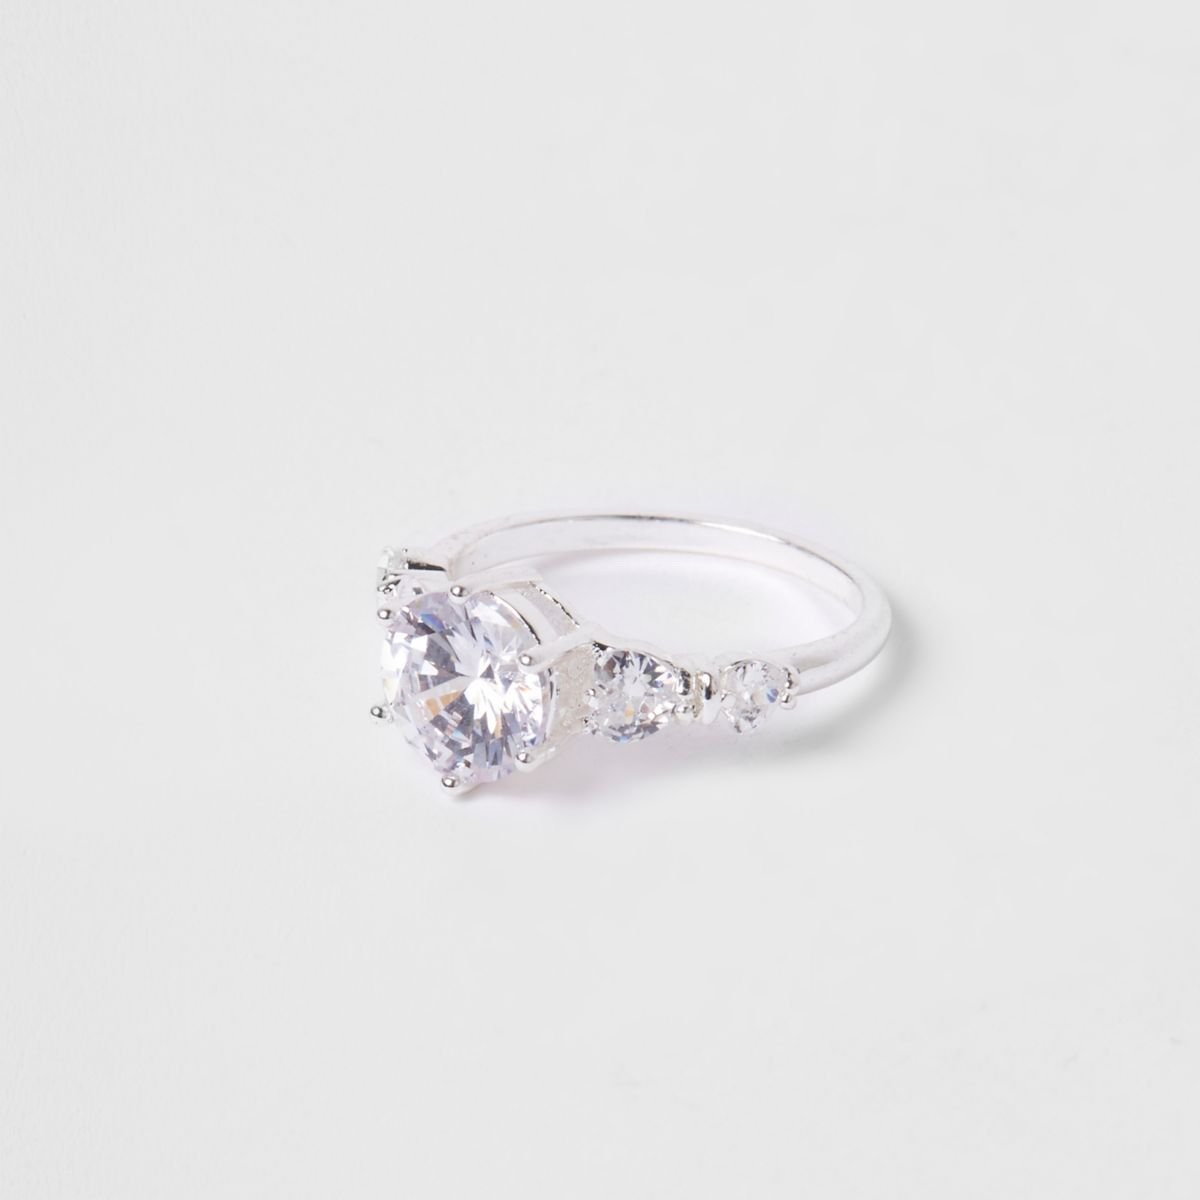 Silver tone Cubic zirconia rhinestone ring